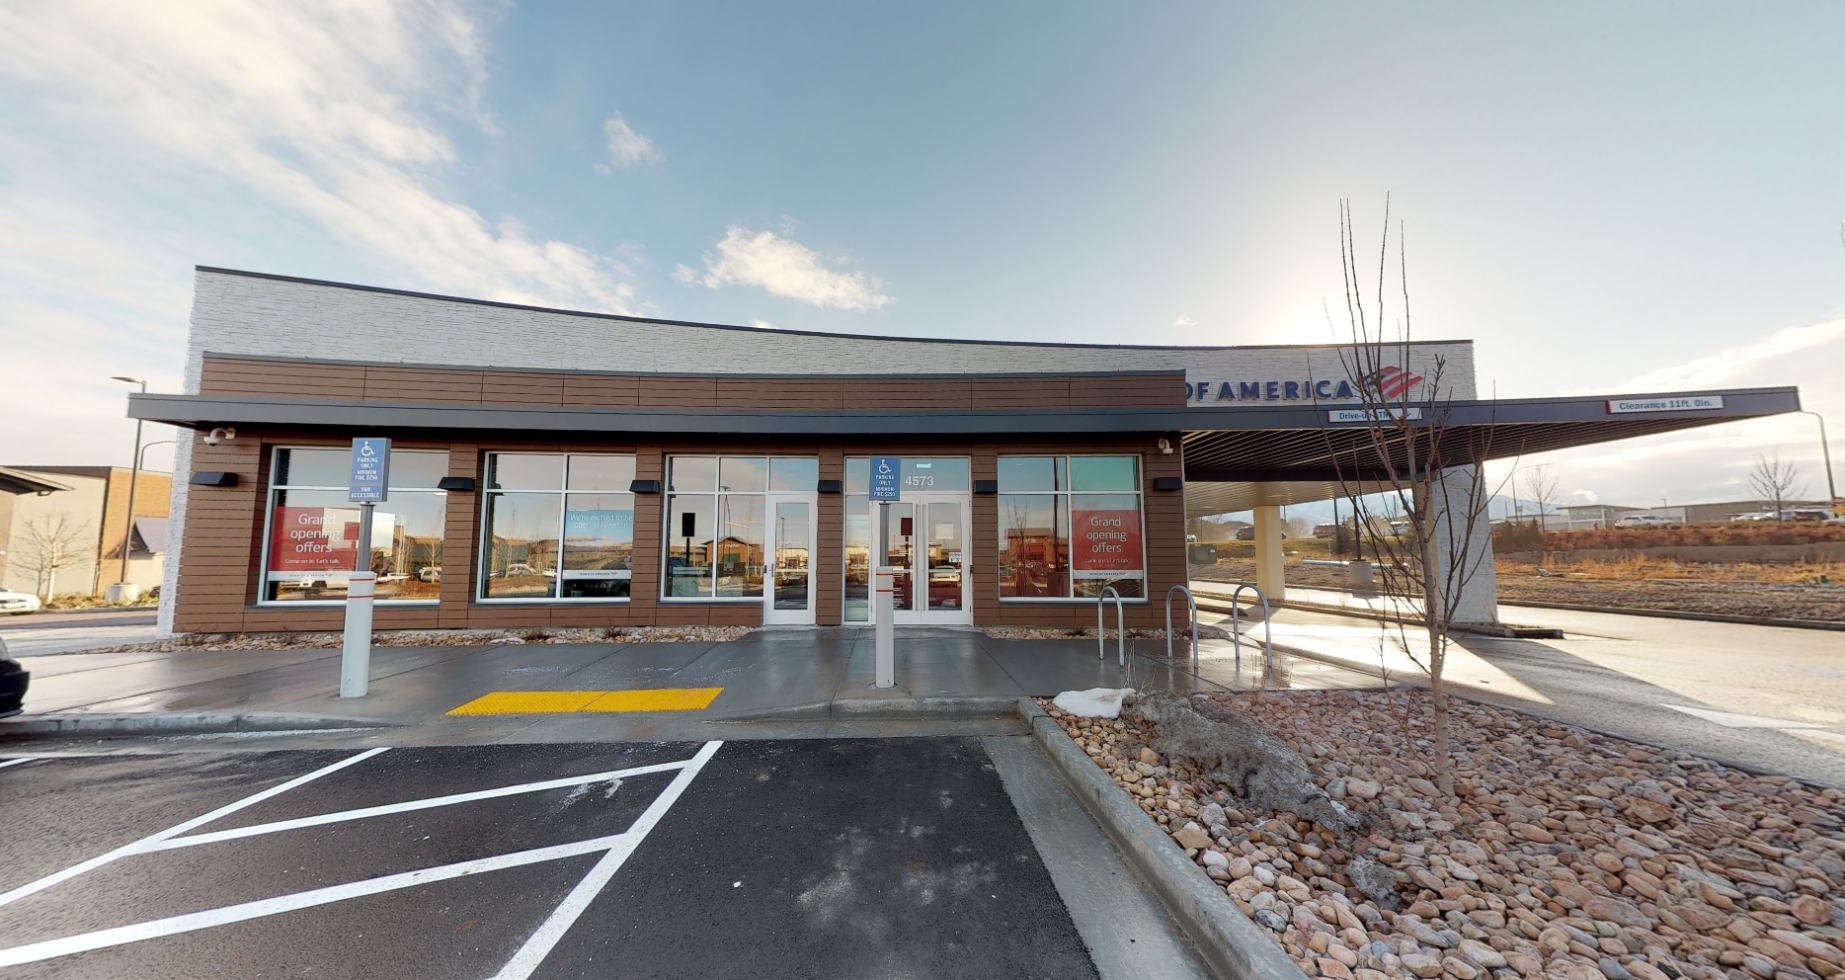 Bank of America financial center with drive-thru ATM | 4573 W Partridge Hill Ln, Riverton, UT 84096